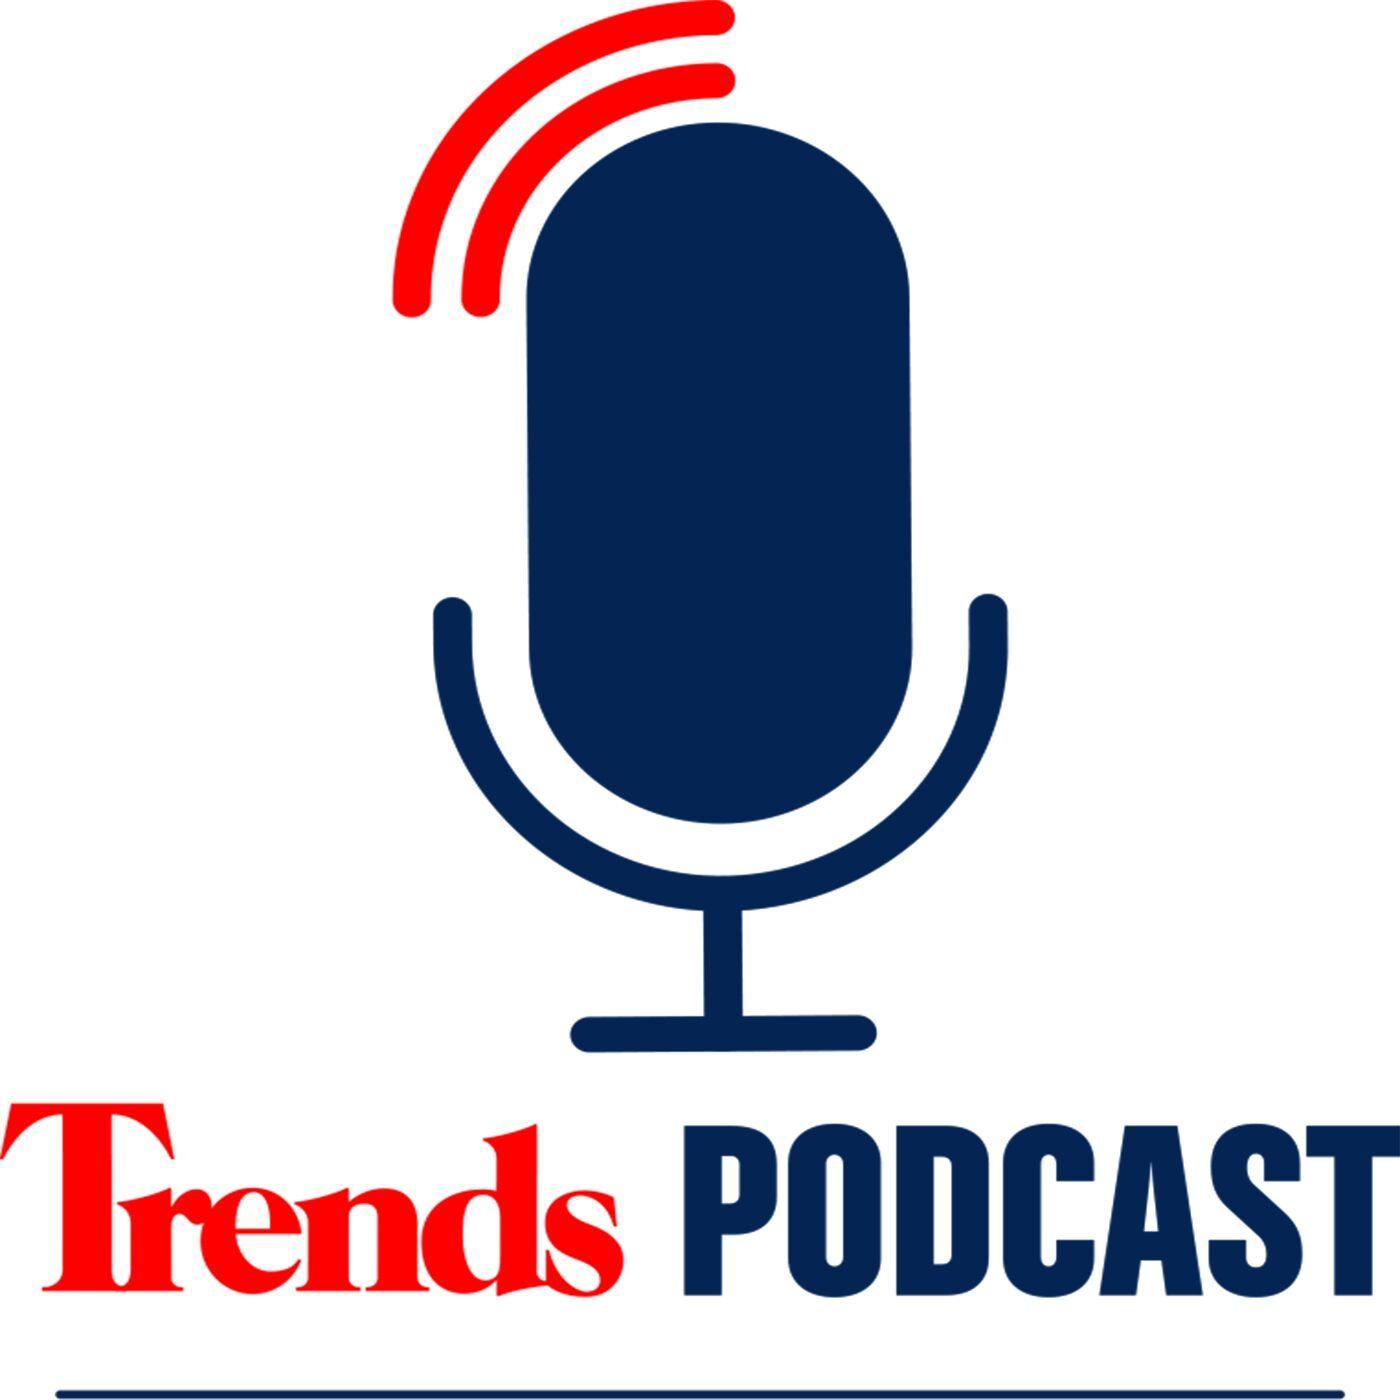 Trends Podcast logo